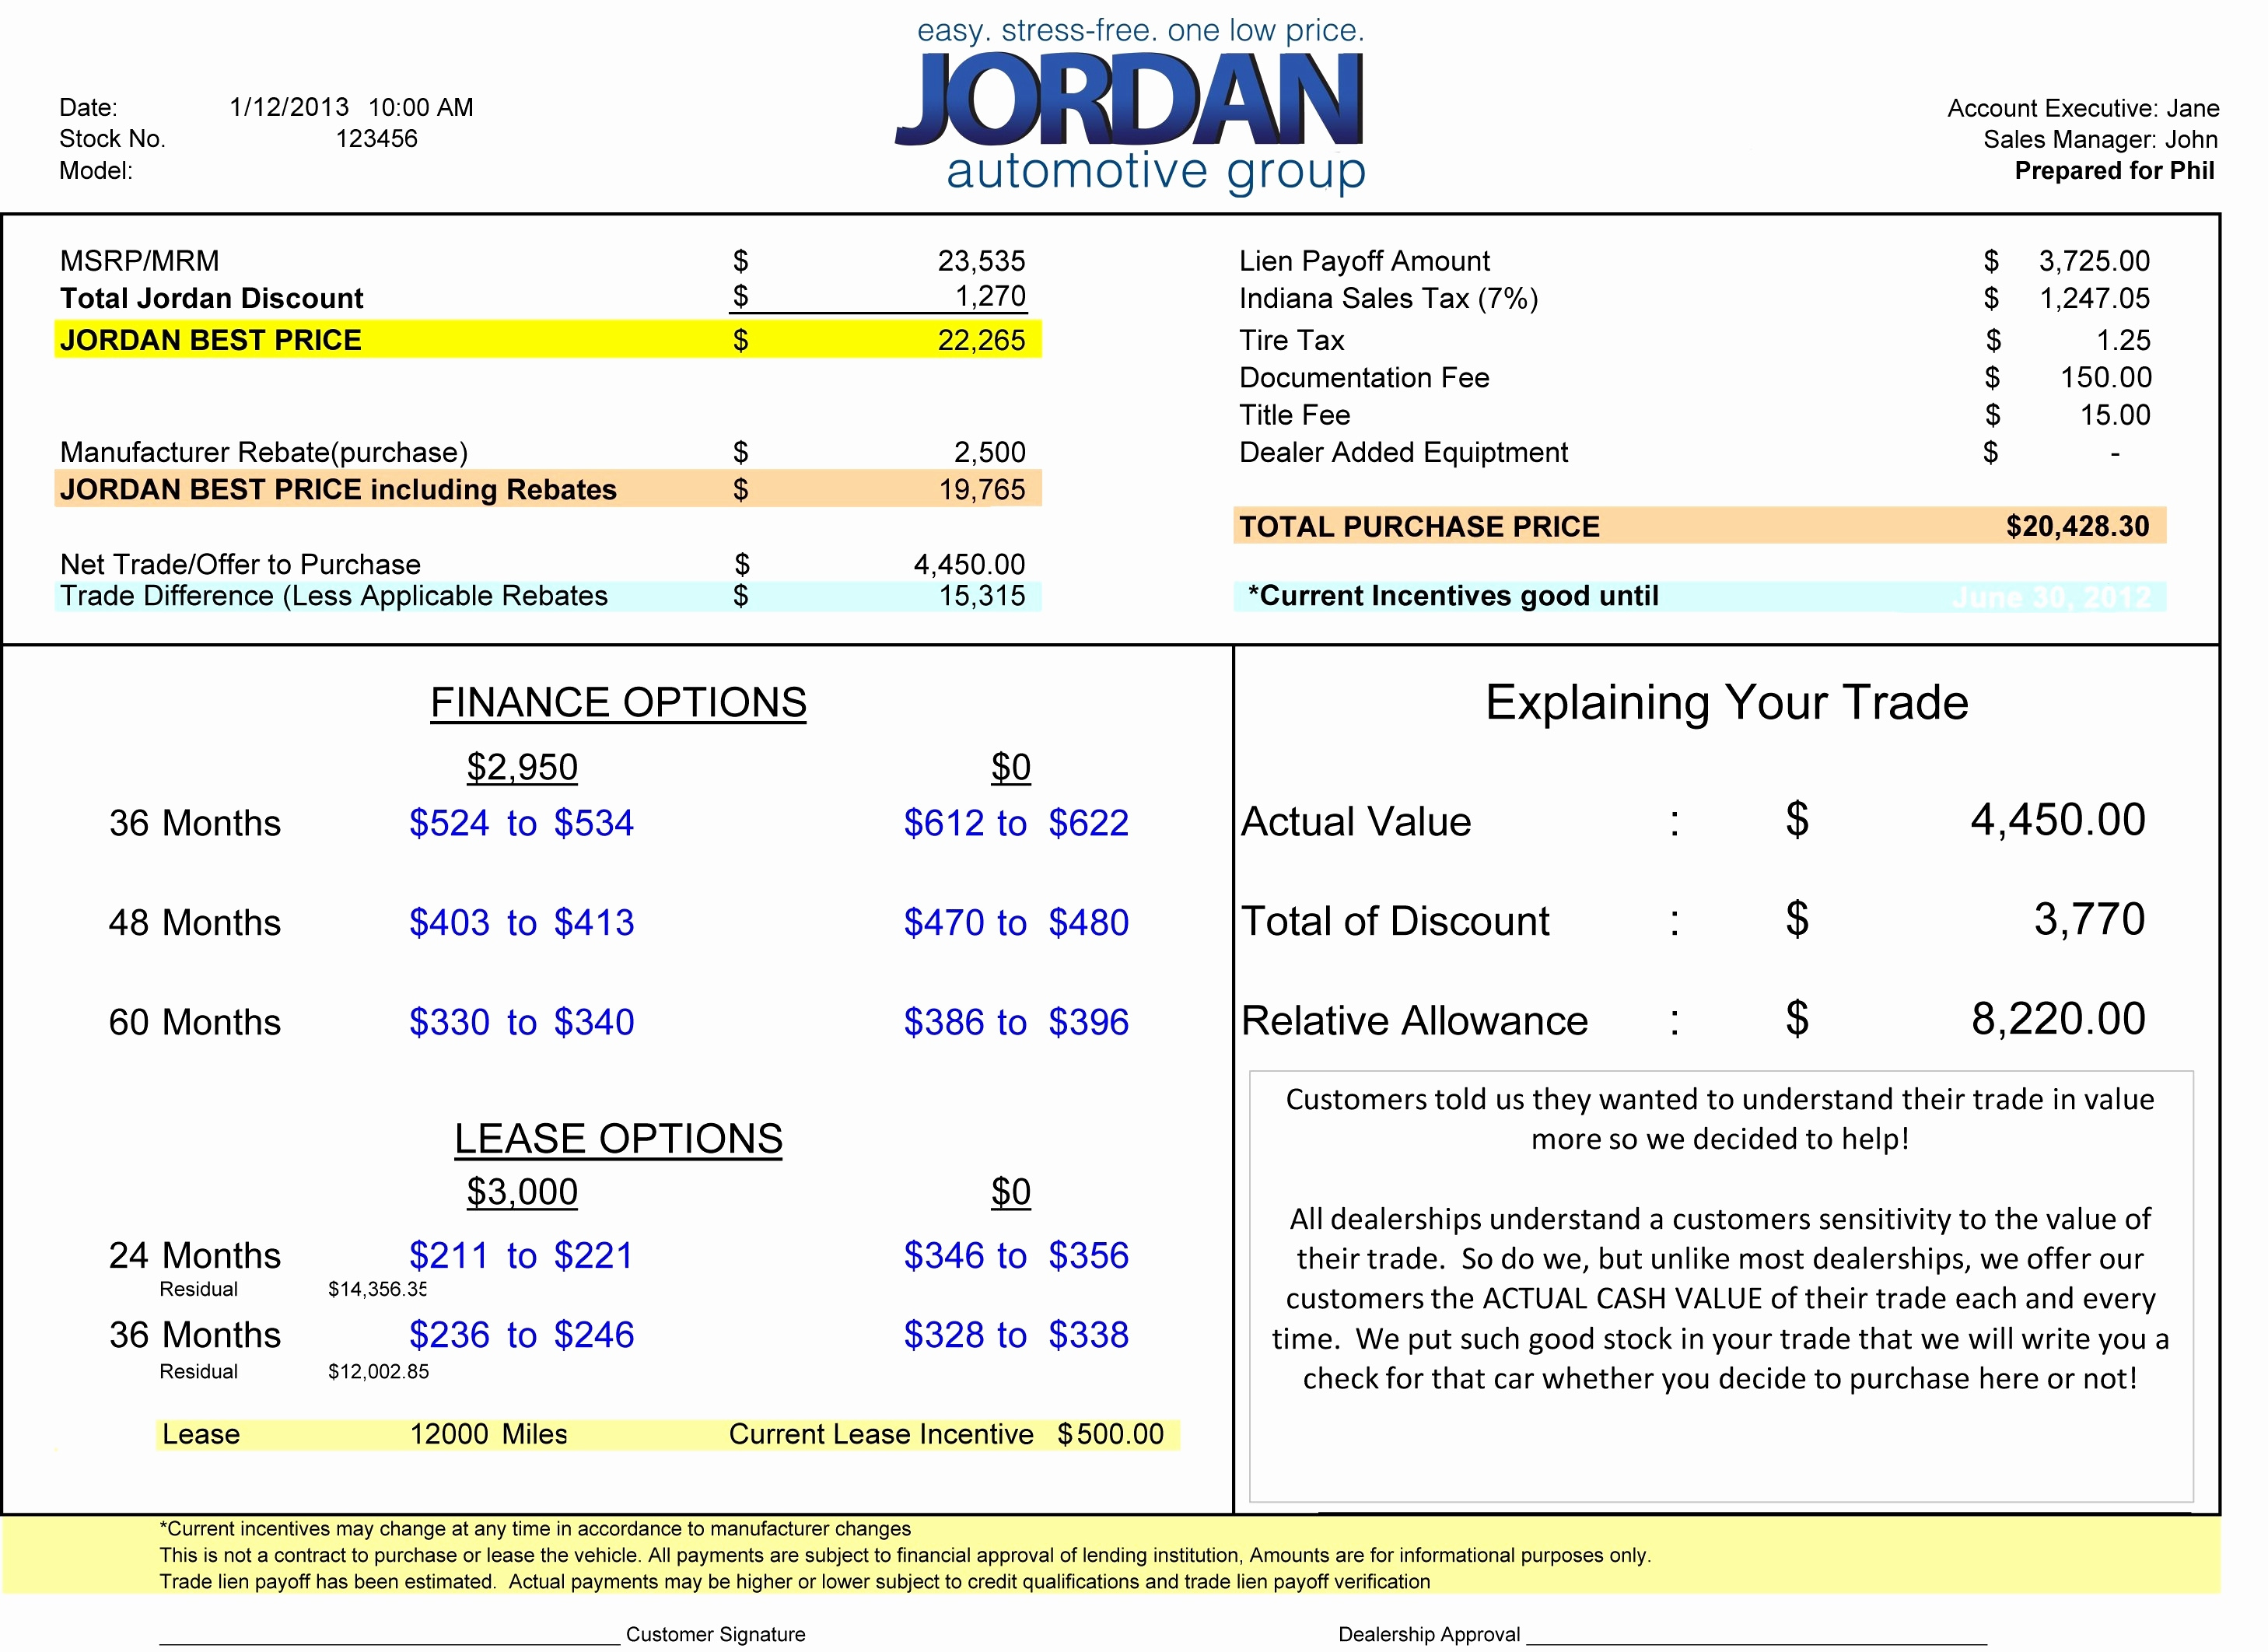 Fleet Management Spreadsheet Within Vehicle Fleet Management Spreadsheet – Spreadsheet Collections